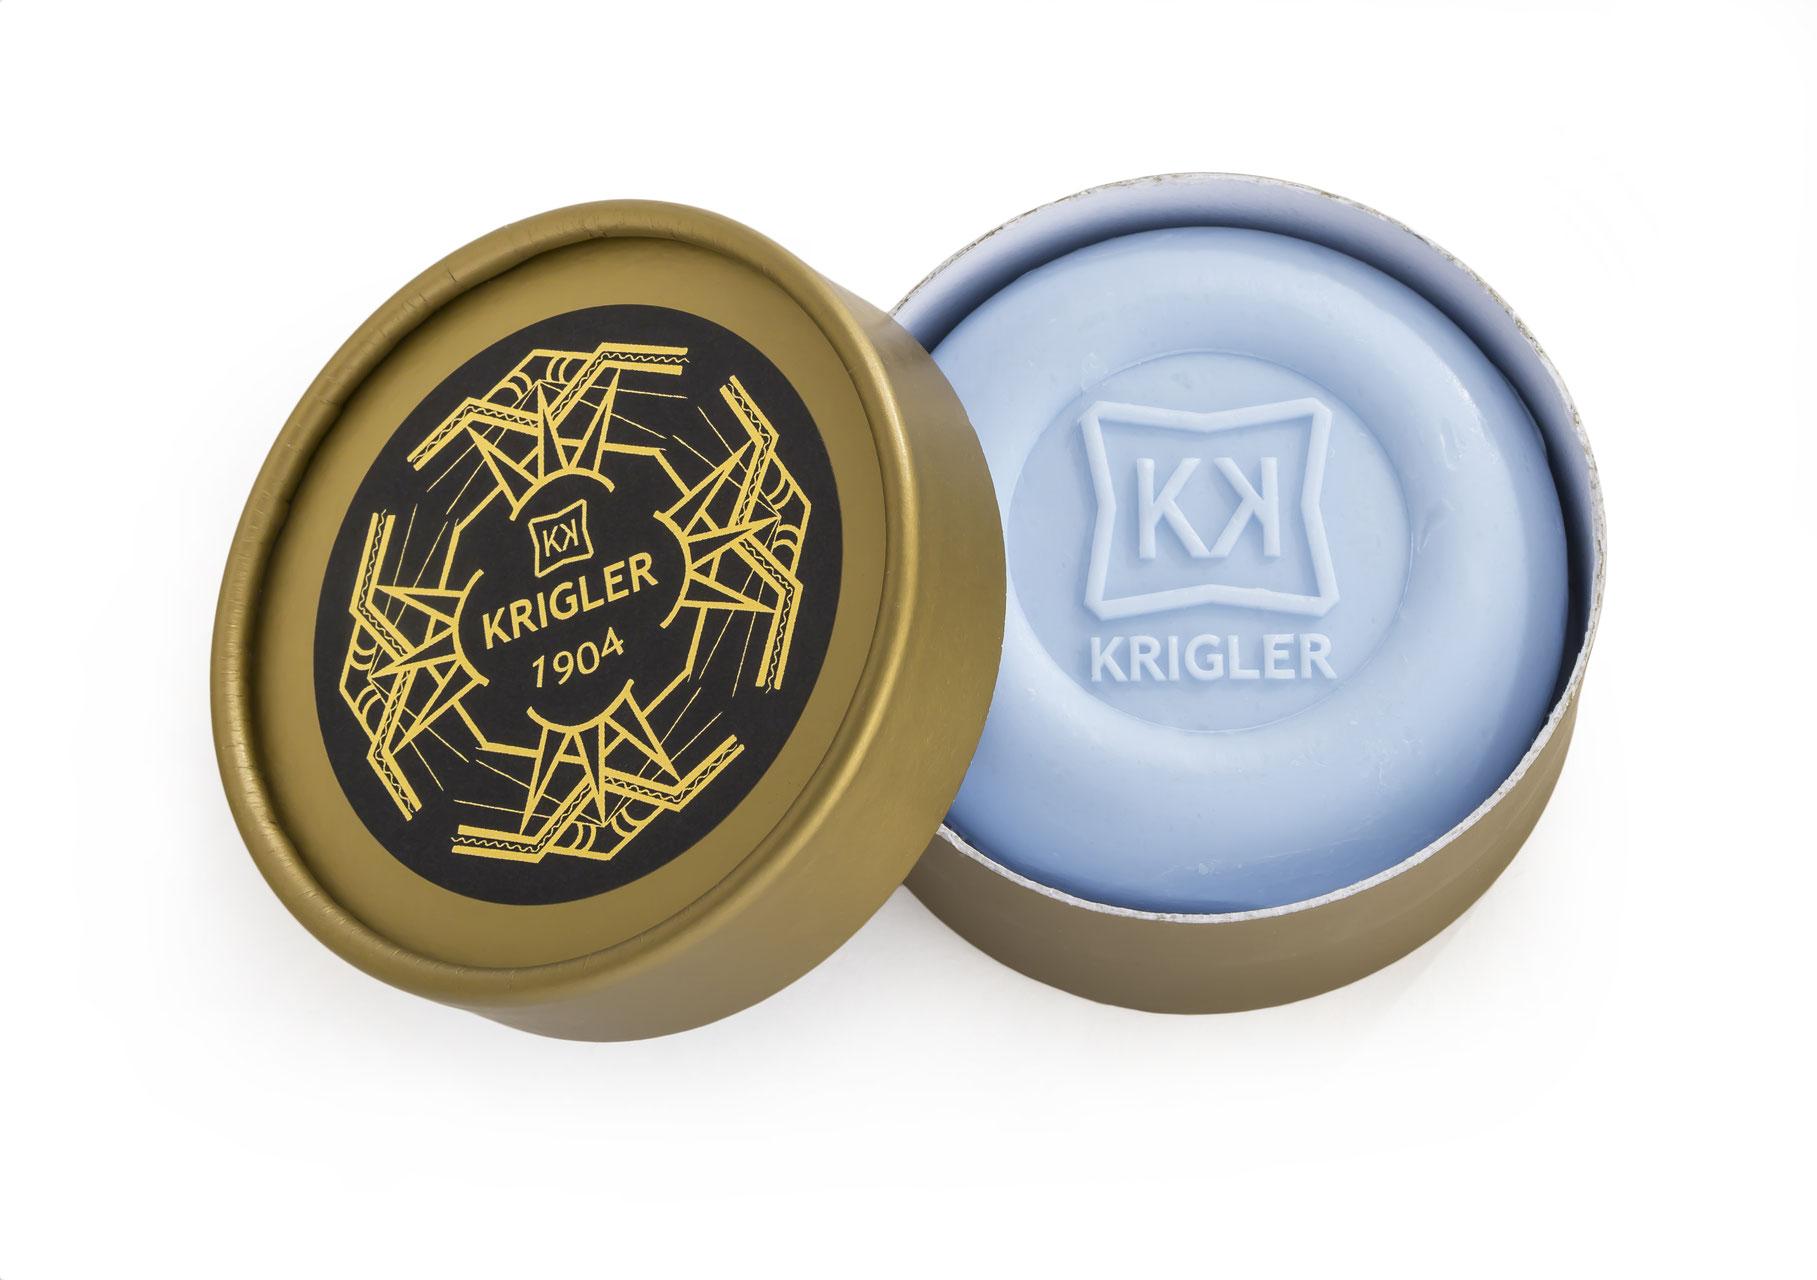 Krigler soap